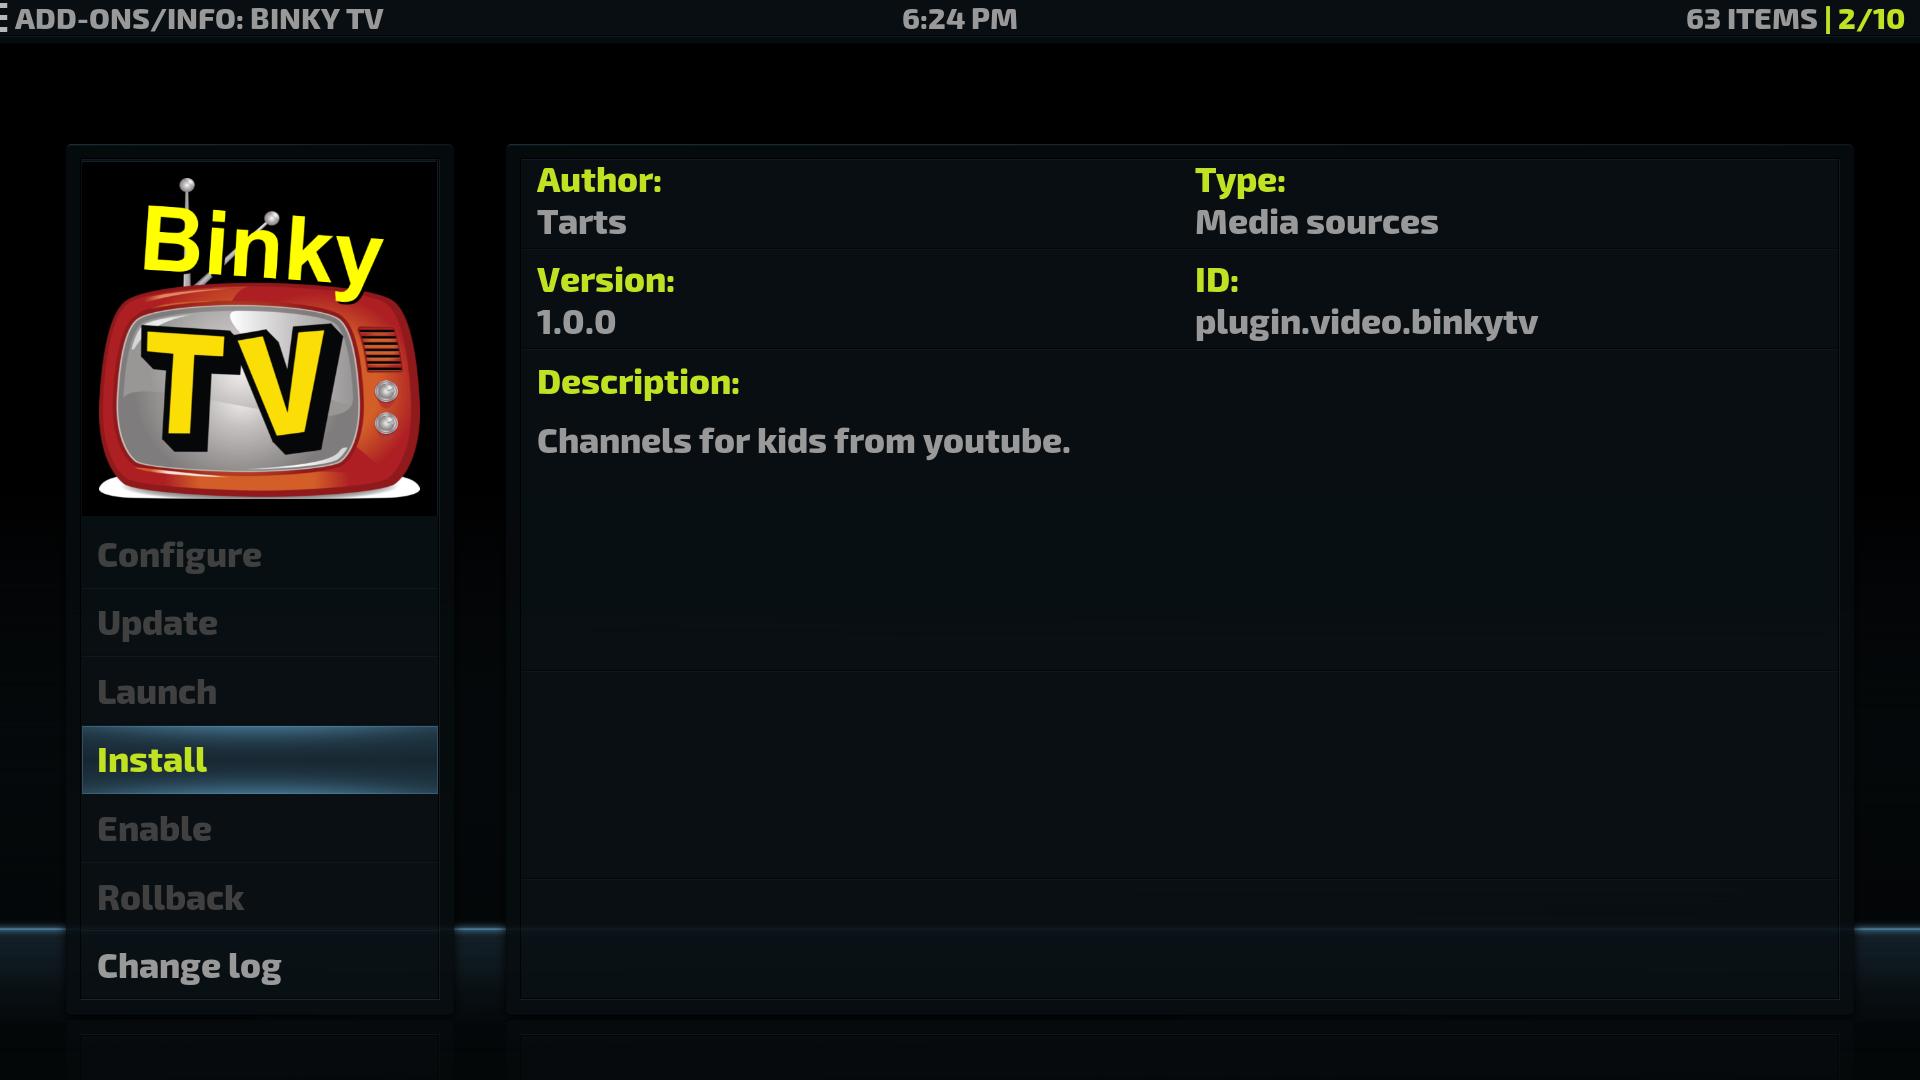 Install Binky Tv on your Kodi device